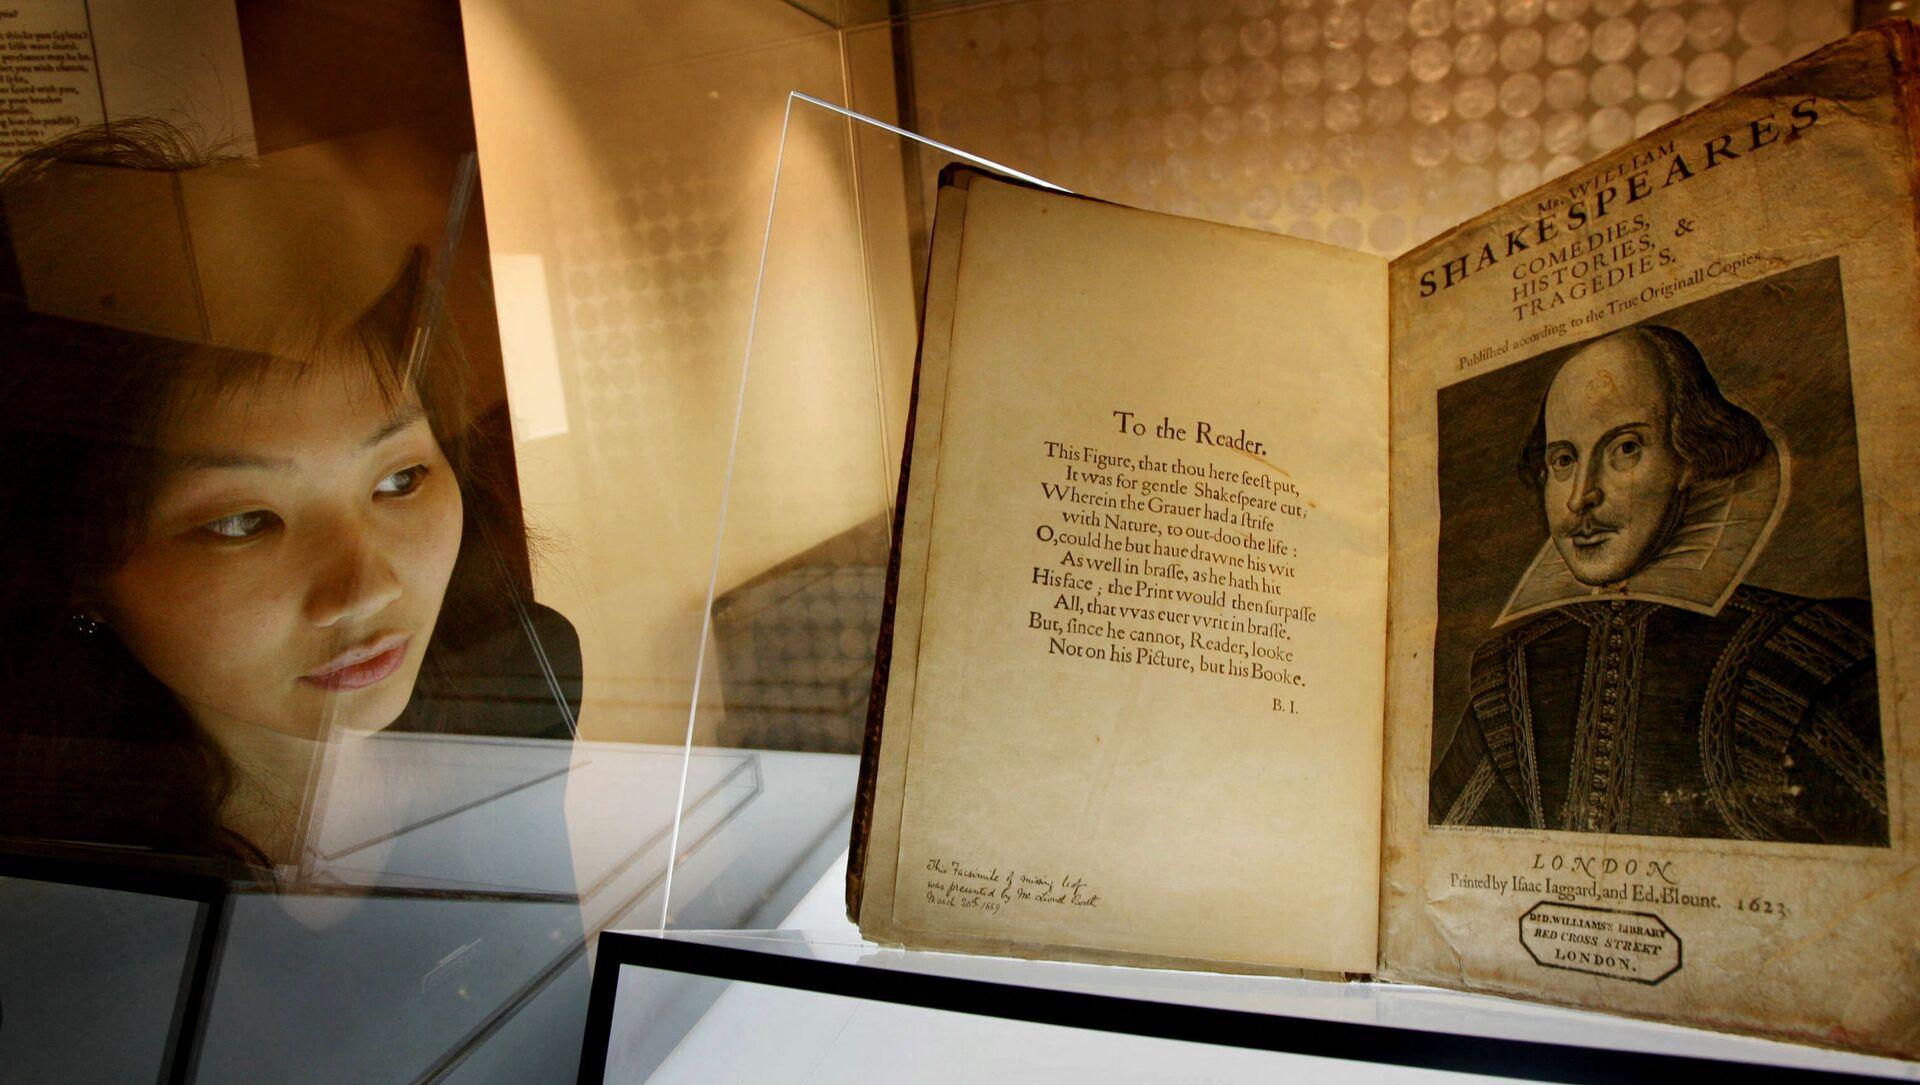 Первое фолио Уильяма Шекспира, фото из архива - Sputnik Азербайджан, 1920, 18.08.2021